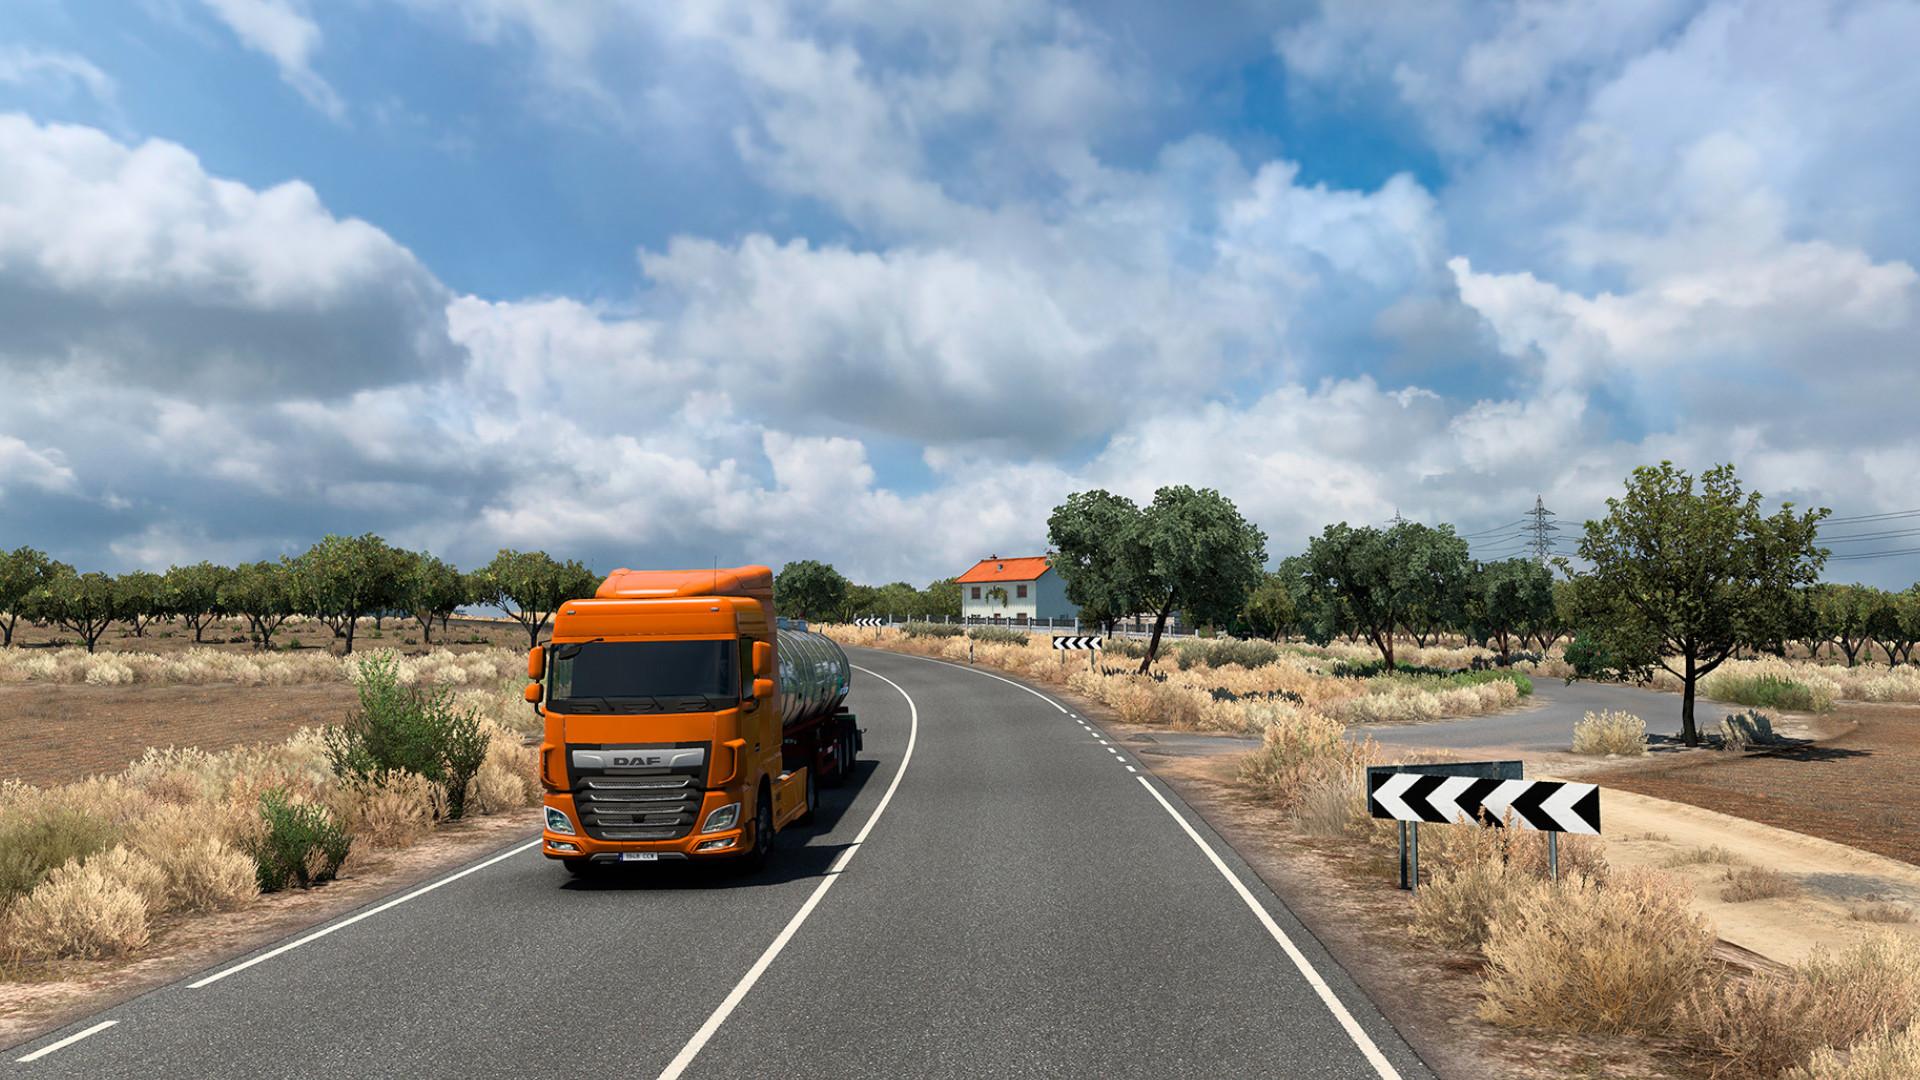 Iberia gets a free update with more roads (in Euro Truck Simulator 2)